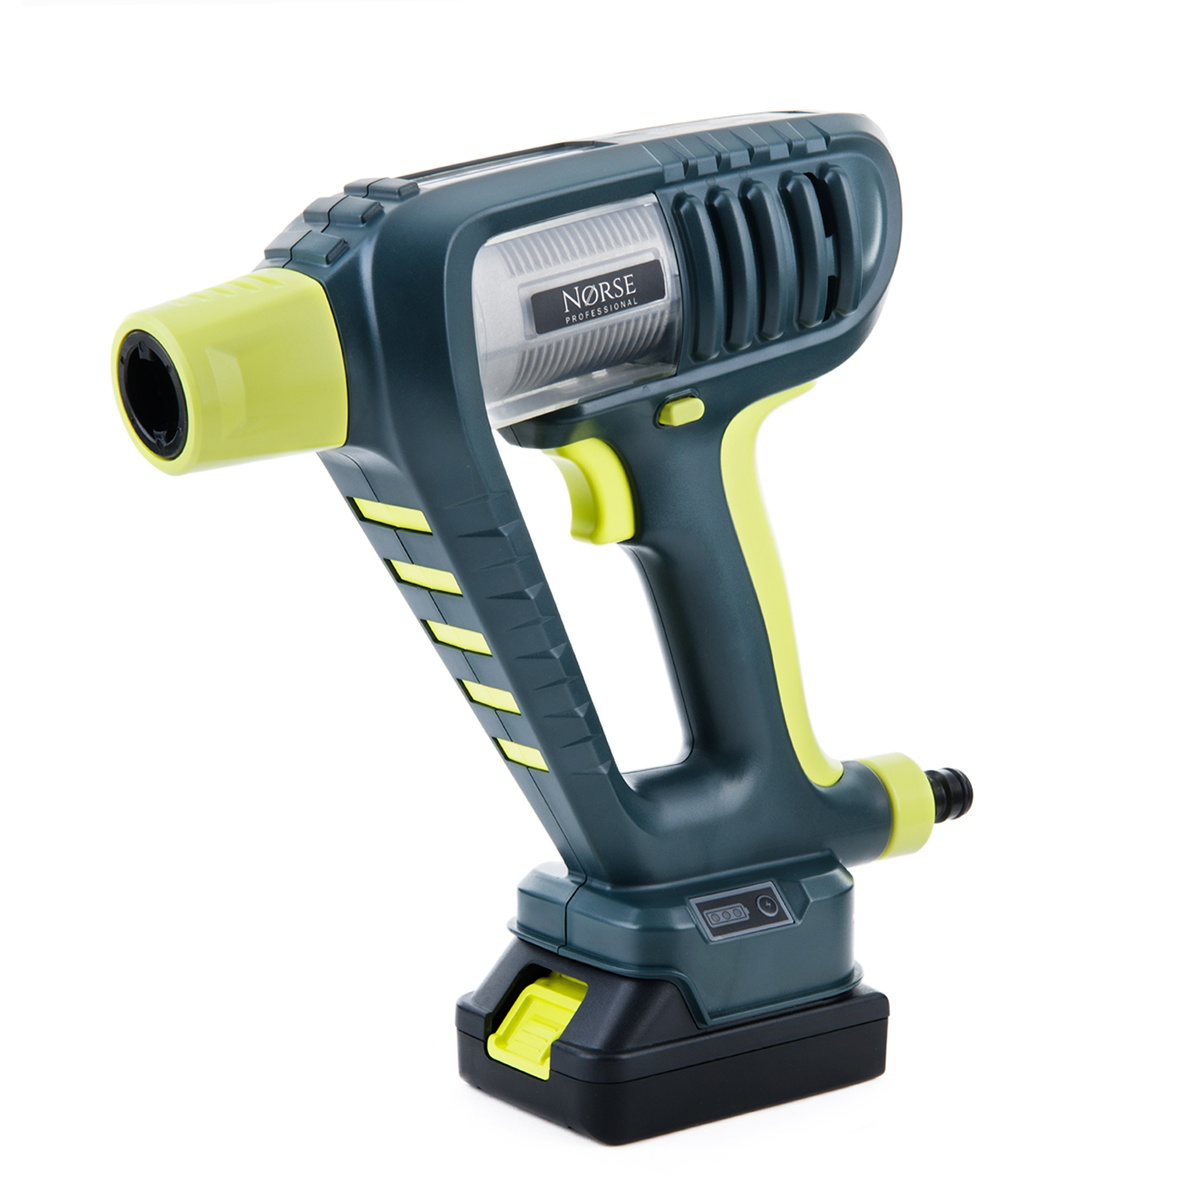 Nørse Professional  SK25i  Electric Pressure Washer